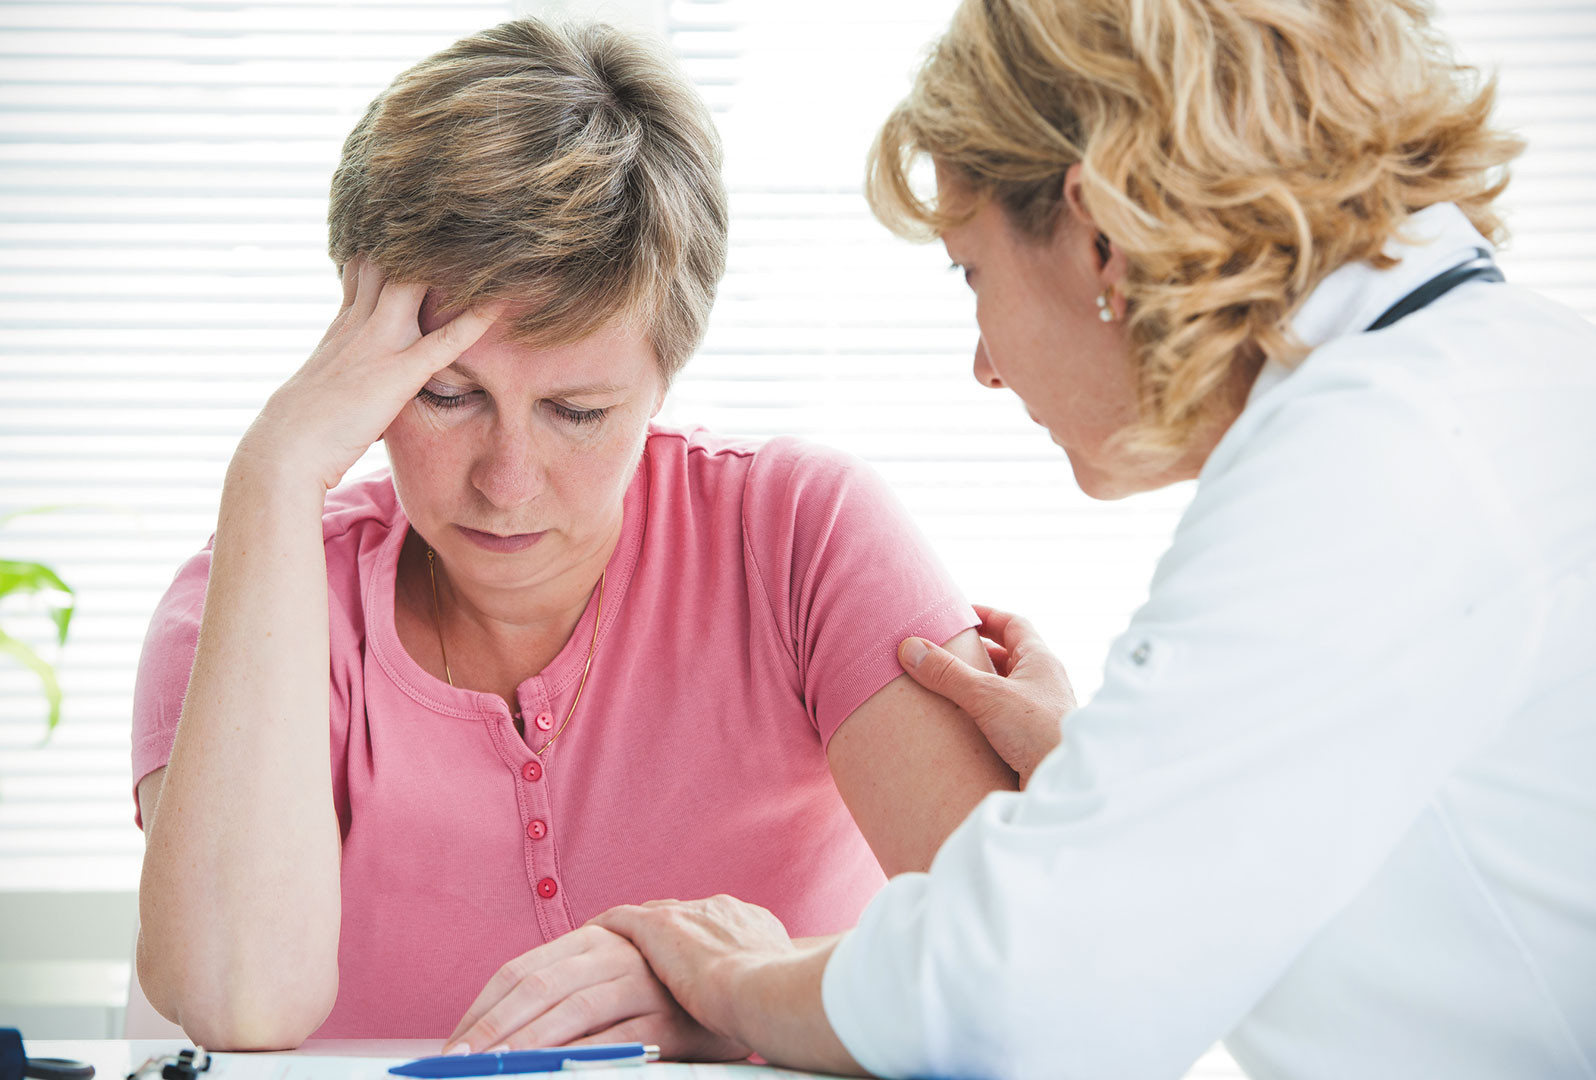 depression-doctor-medications